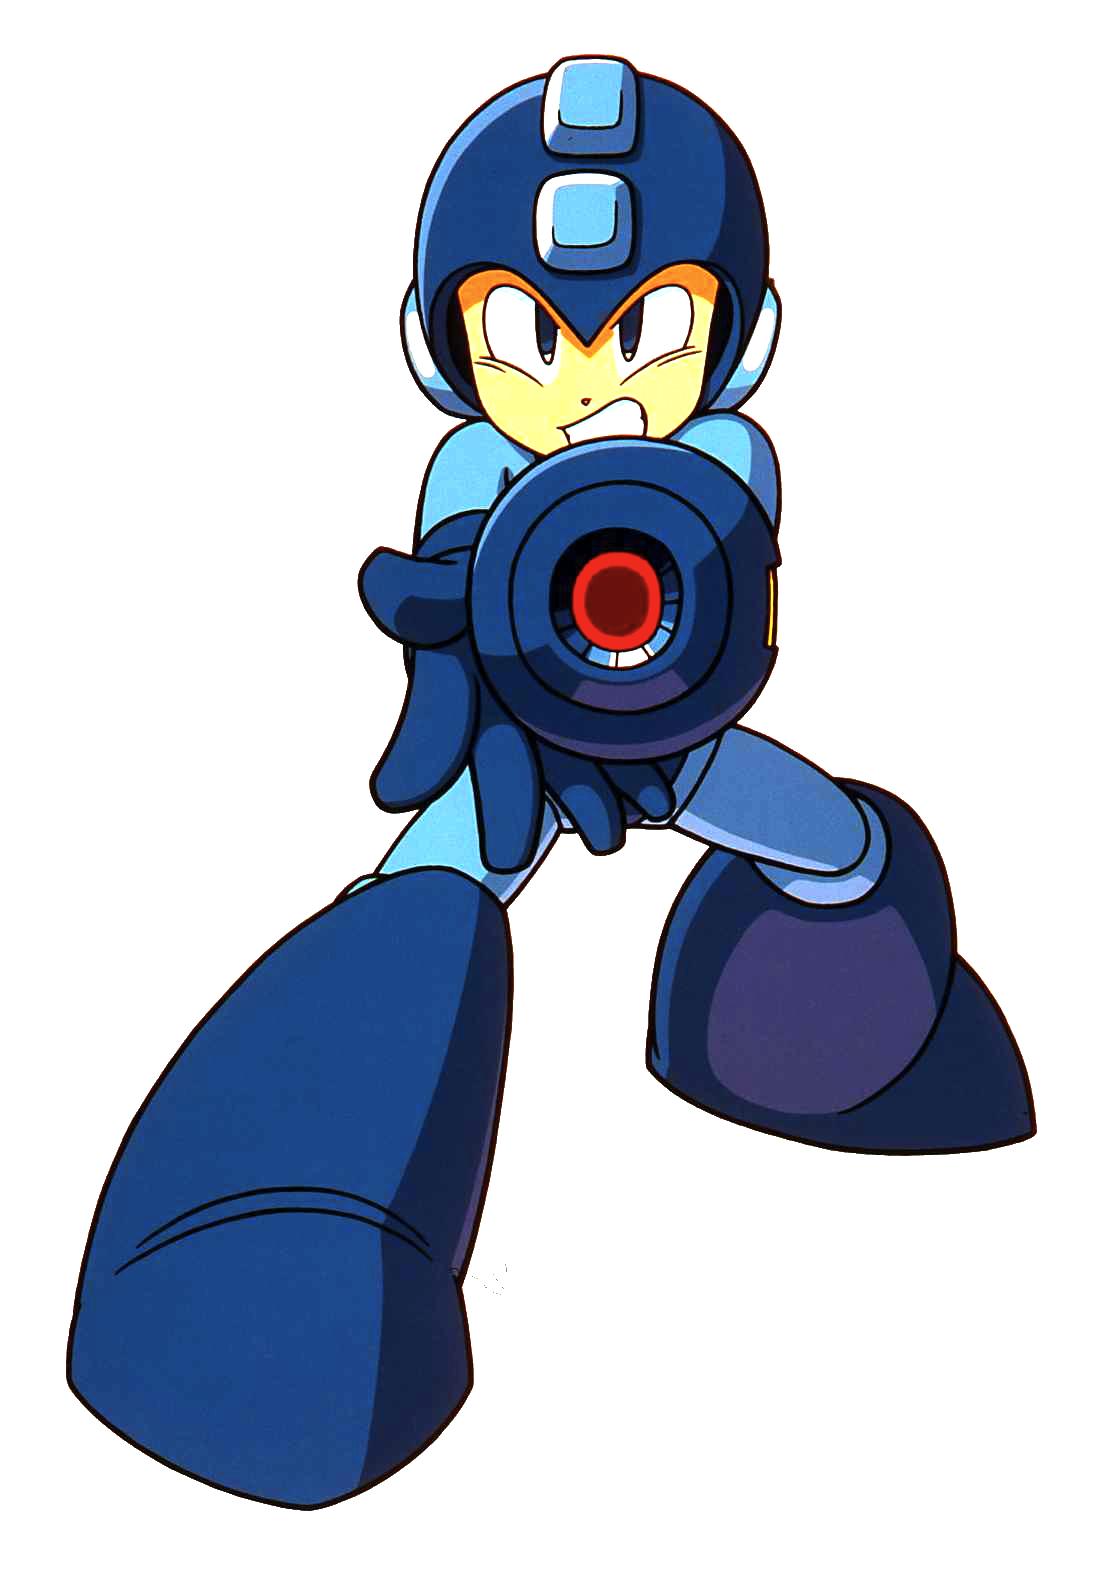 Download Megaman Clipart HQ PNG Image.